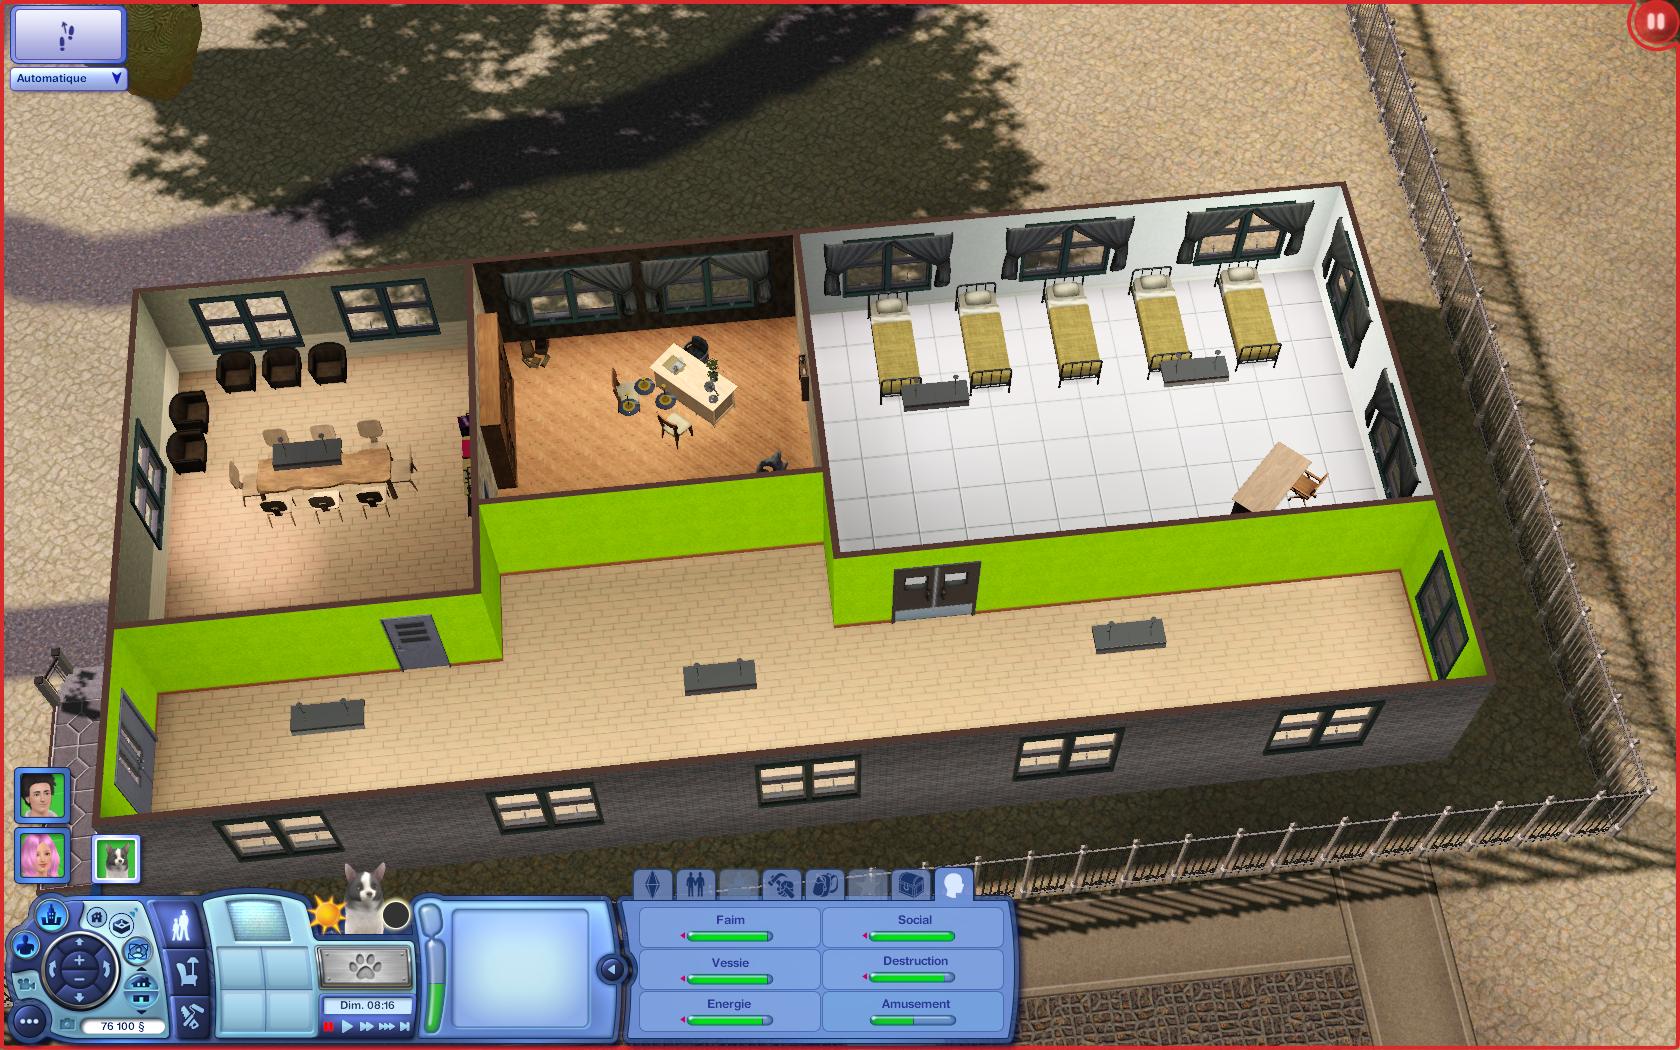 Le JDR Fair Play et les Sims Ts3w_2013_08_11_09_51_39_64_by_phoeniciands-d6hlyrj